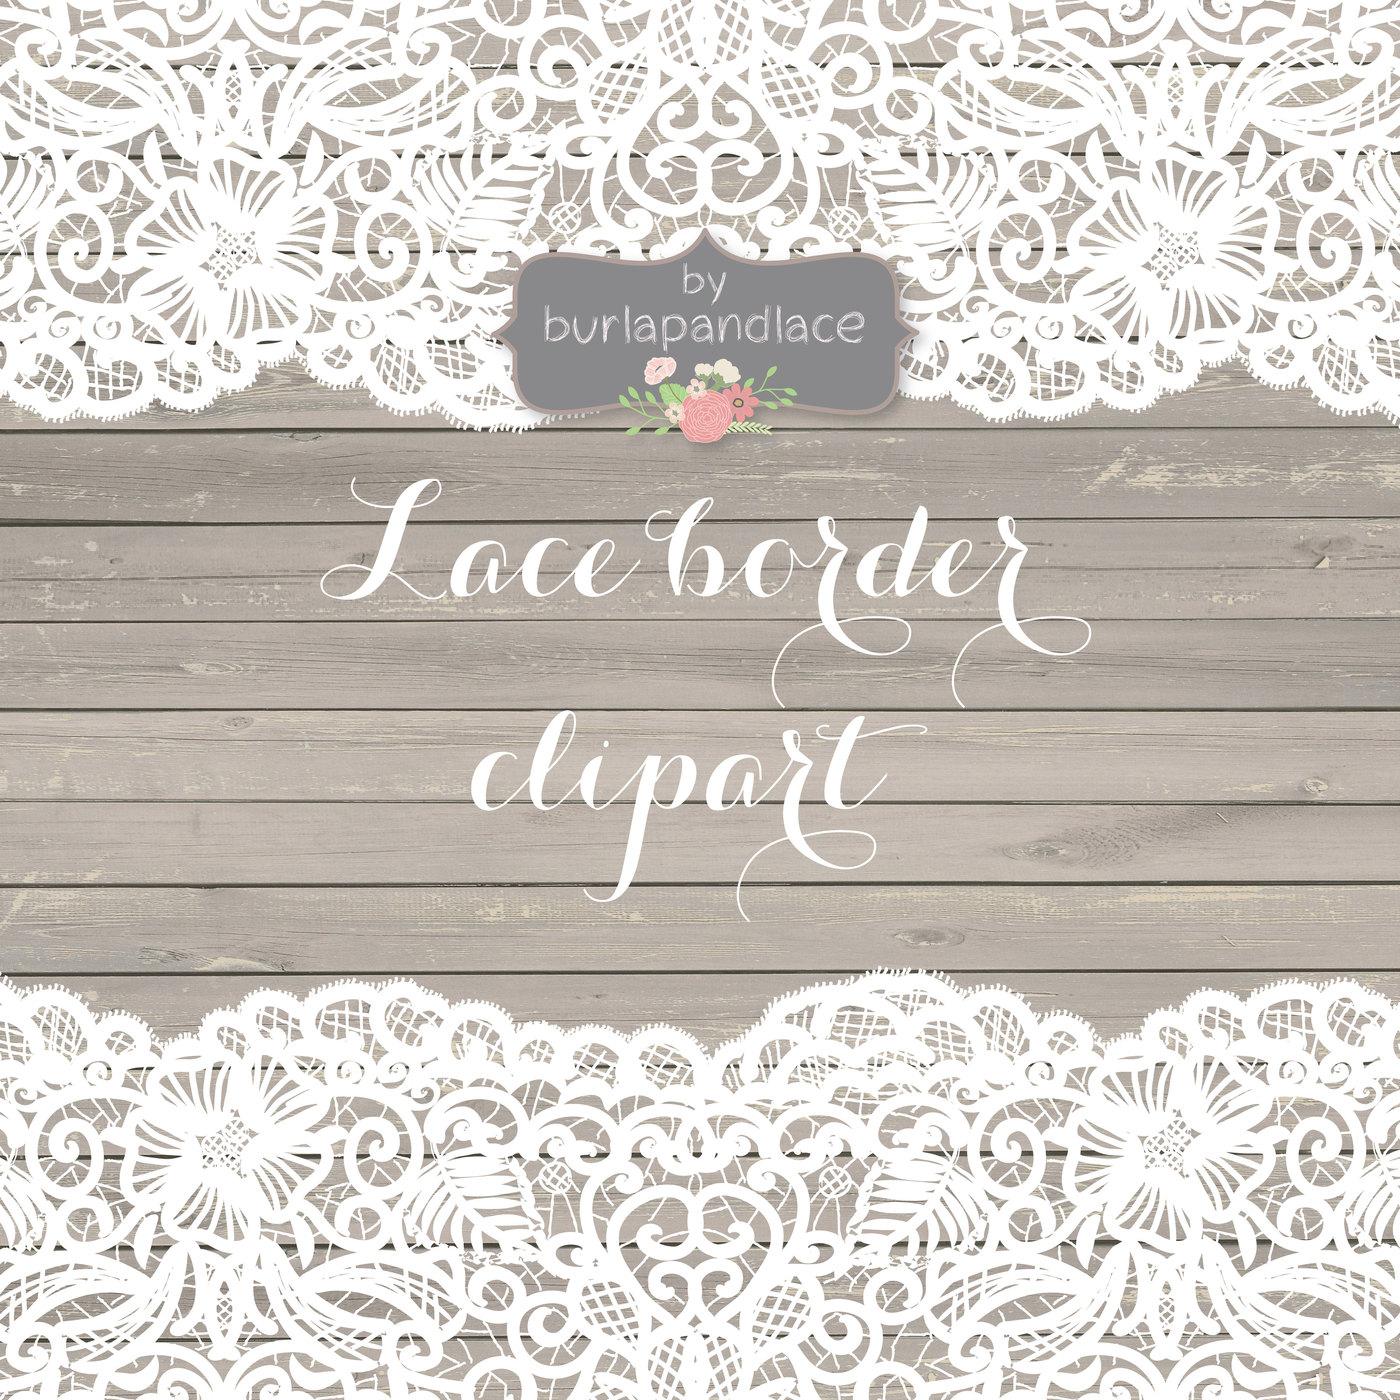 1400x1400 Vector Lace Border Rustic, Wedding Invitation Border, Frame, Lace